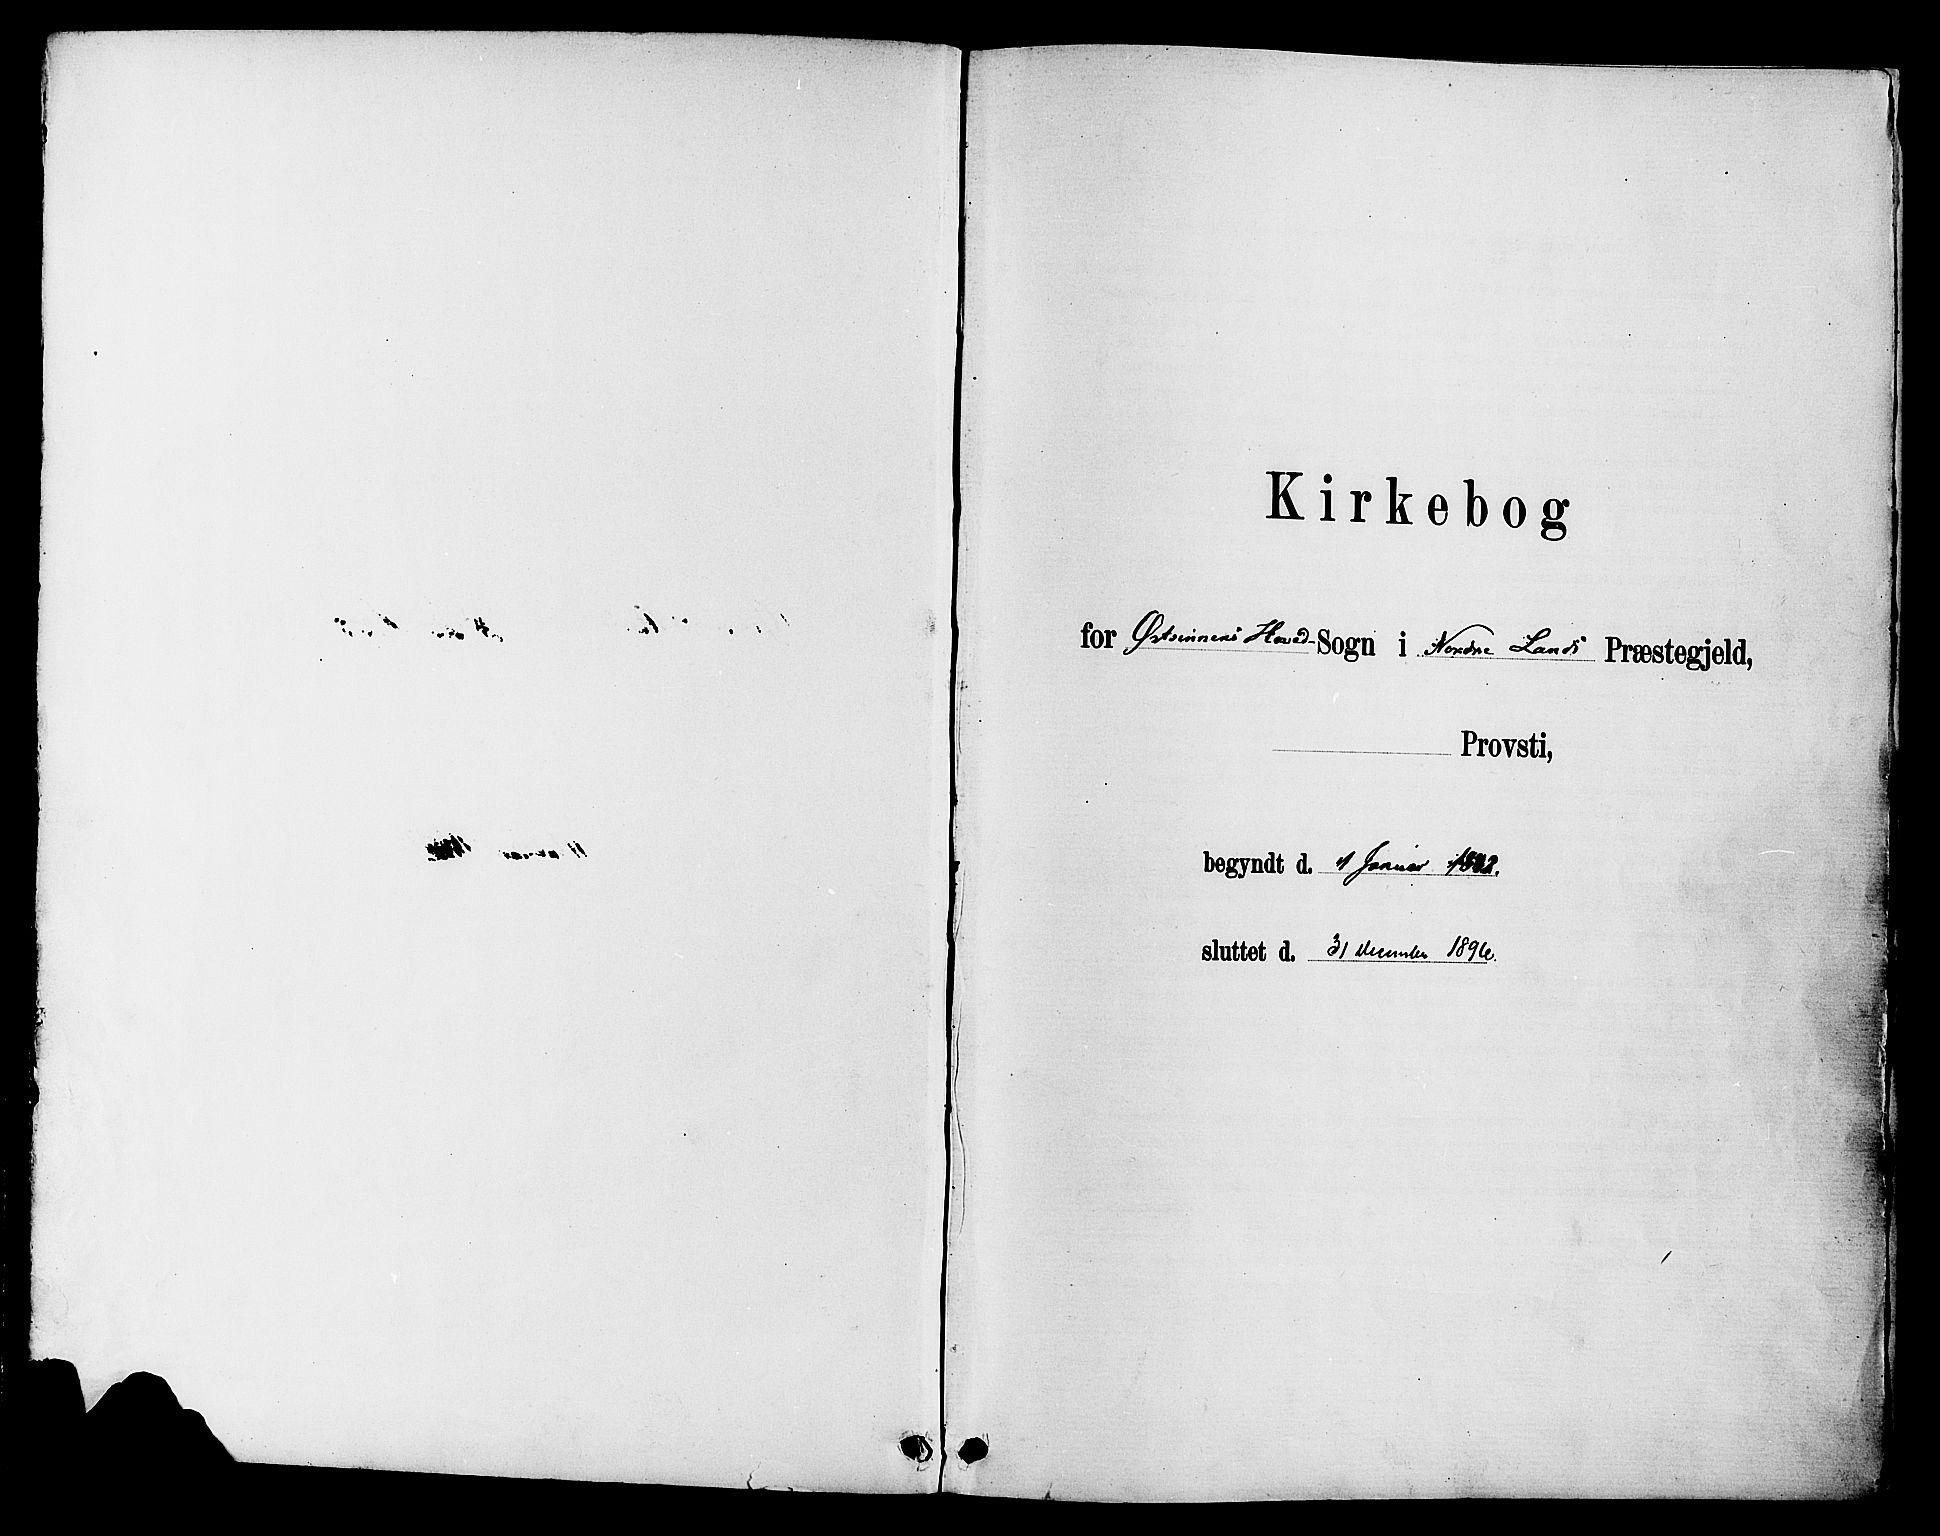 SAH, Nordre Land prestekontor, Ministerialbok nr. 3, 1882-1896